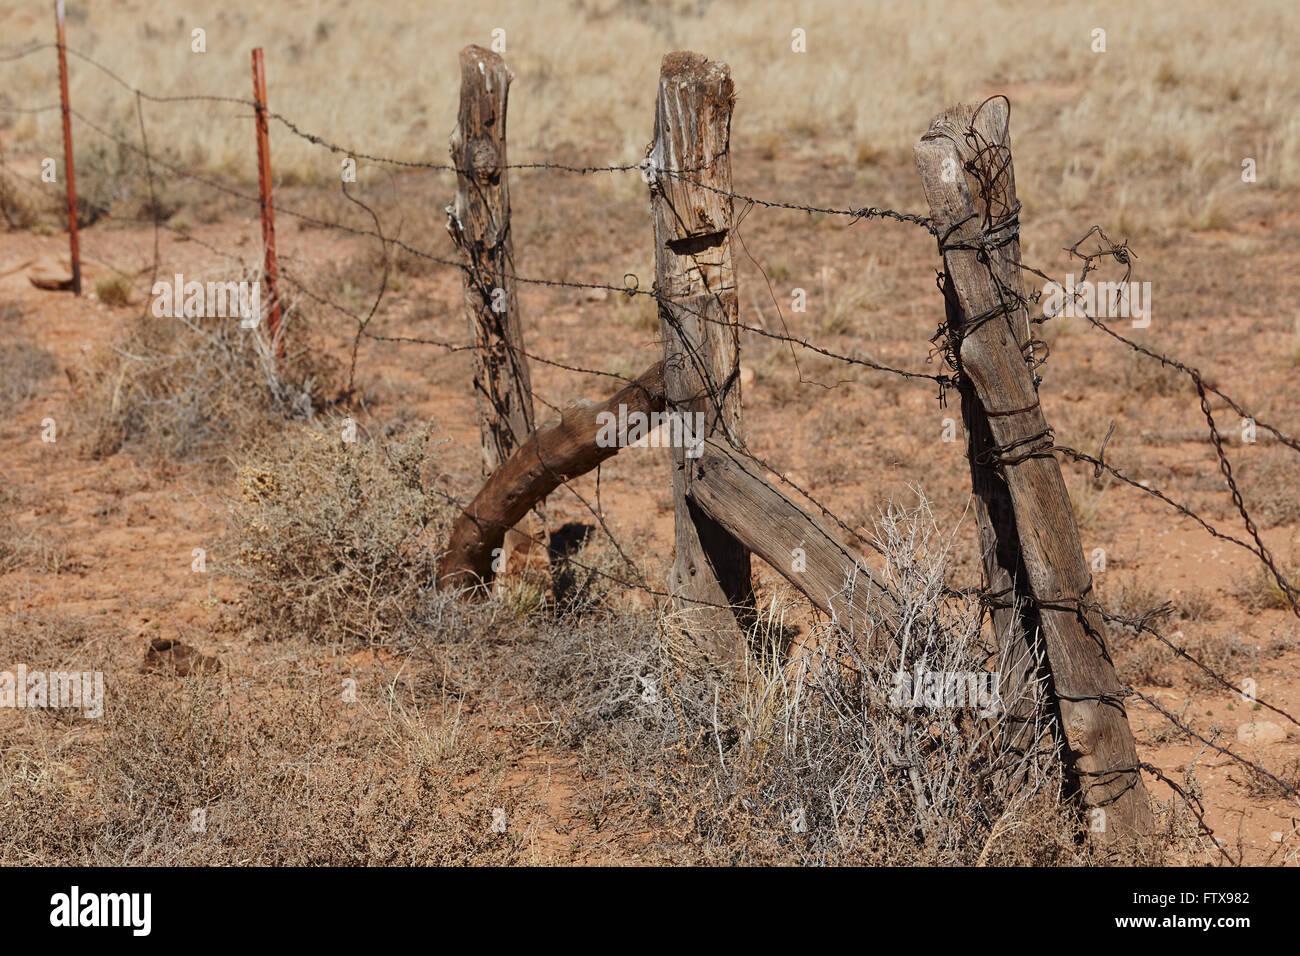 wood and barbed wire fence, Arizona, USA Stock Photo